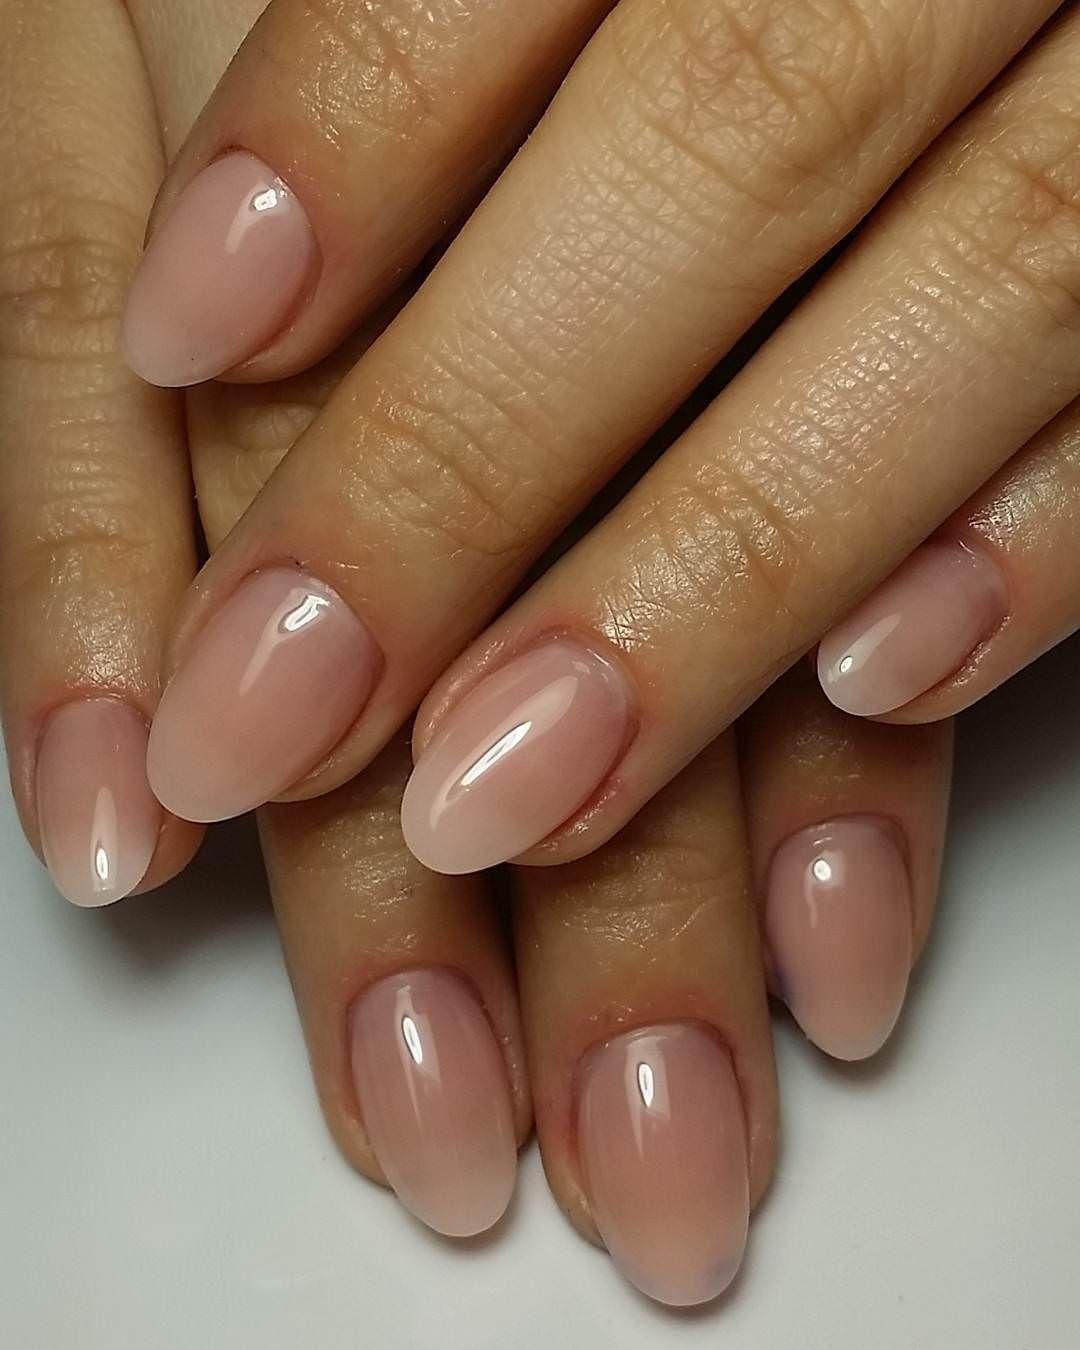 Image Result For Gel Nails Natural Oval Oval Nails Designs Short Acrylic Nails Natural Acrylic Nails